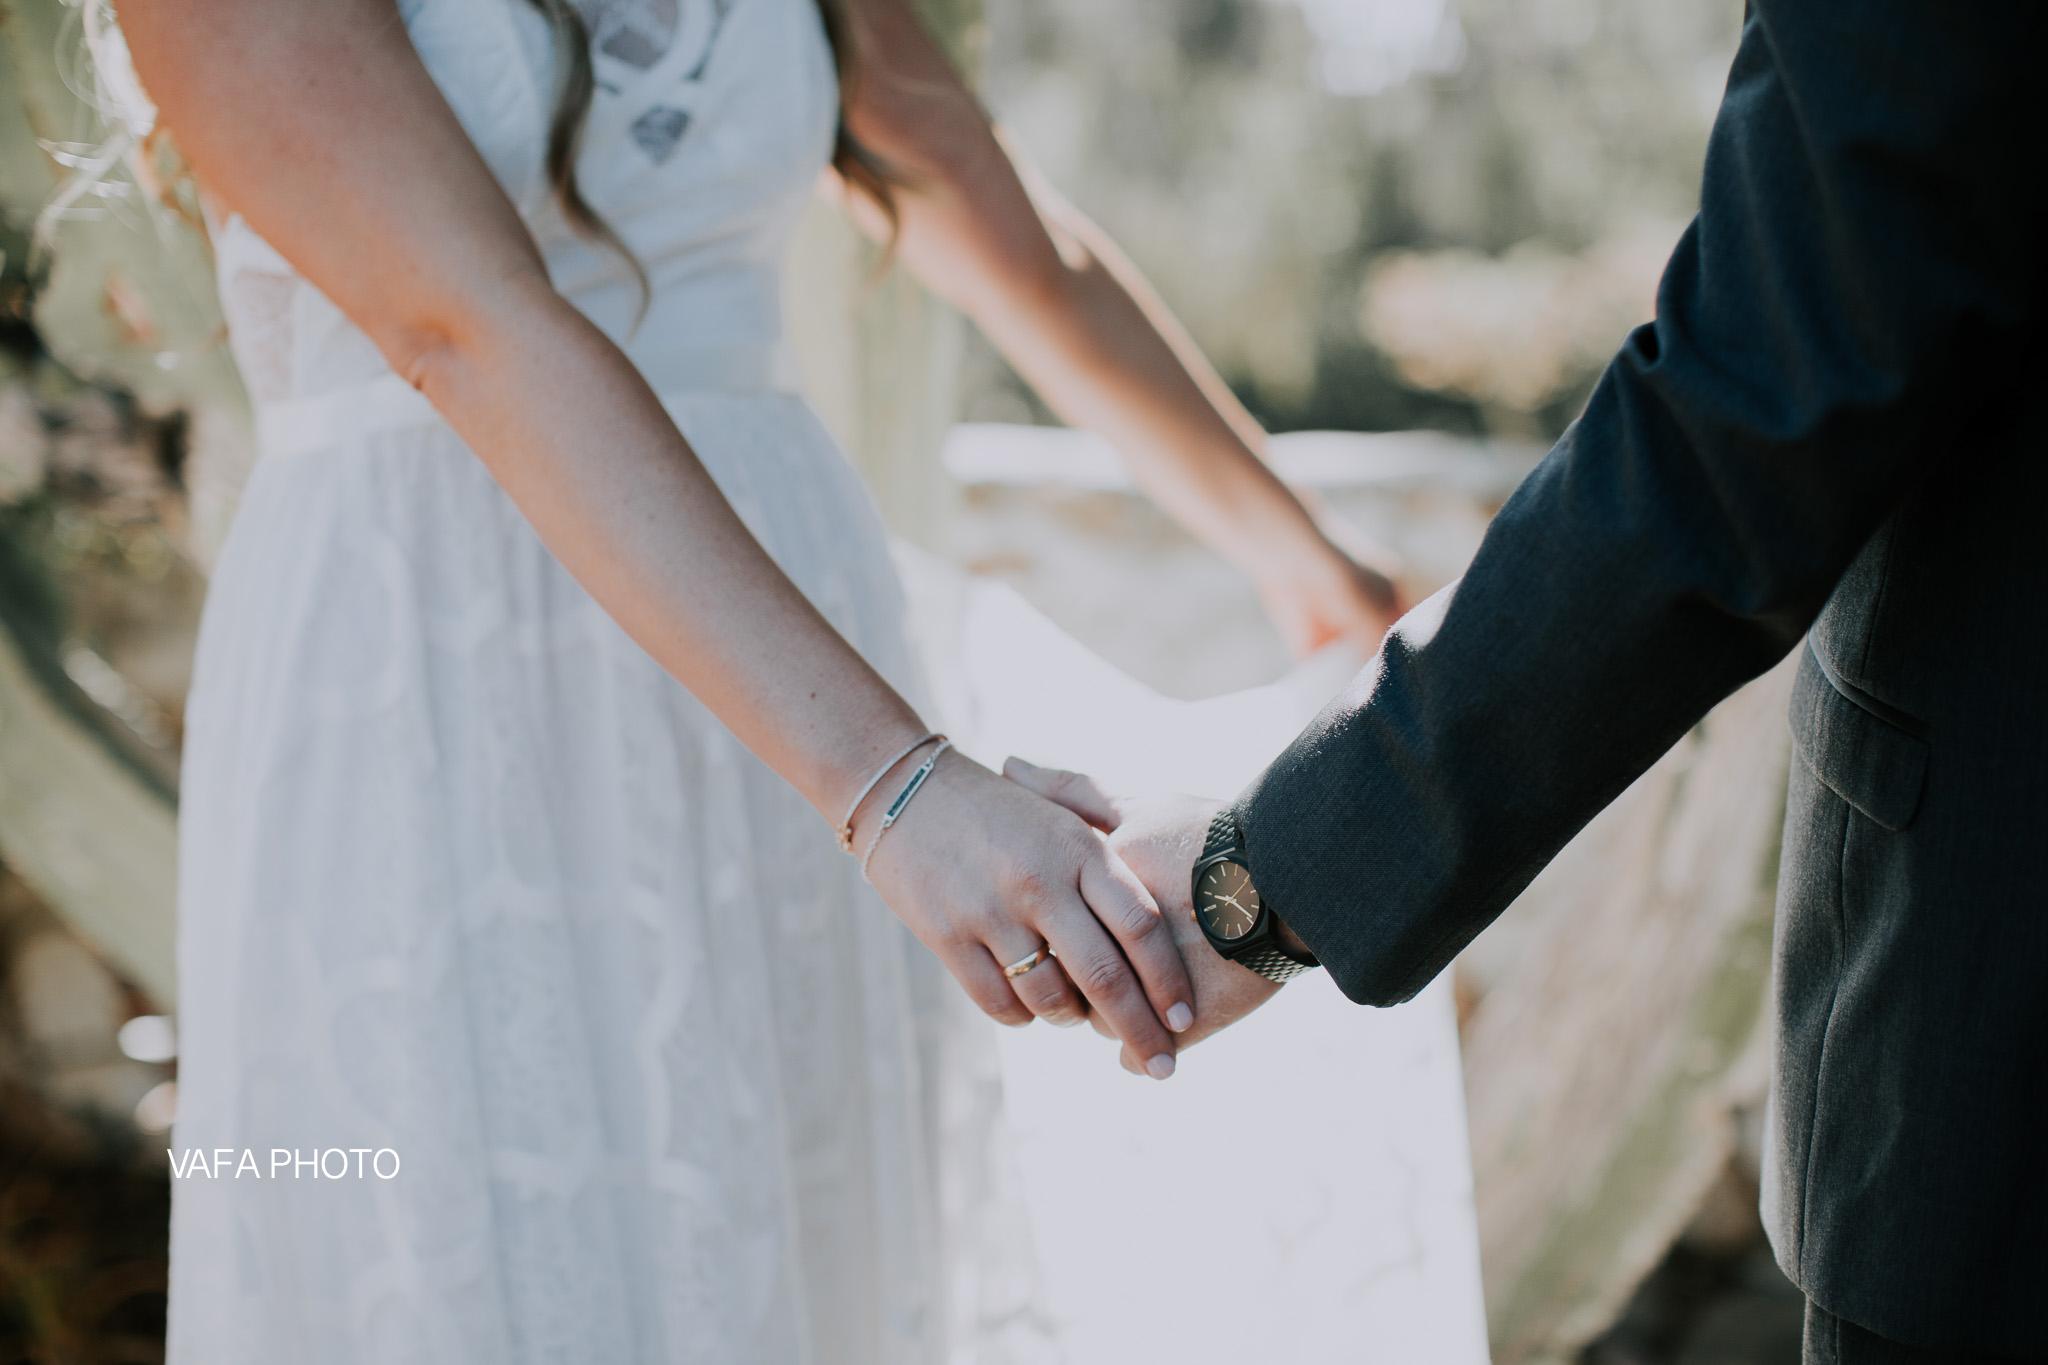 Leo-Carrillo-Ranch-Wedding-Lauren-Mike-Vafa-Photo-285.jpg